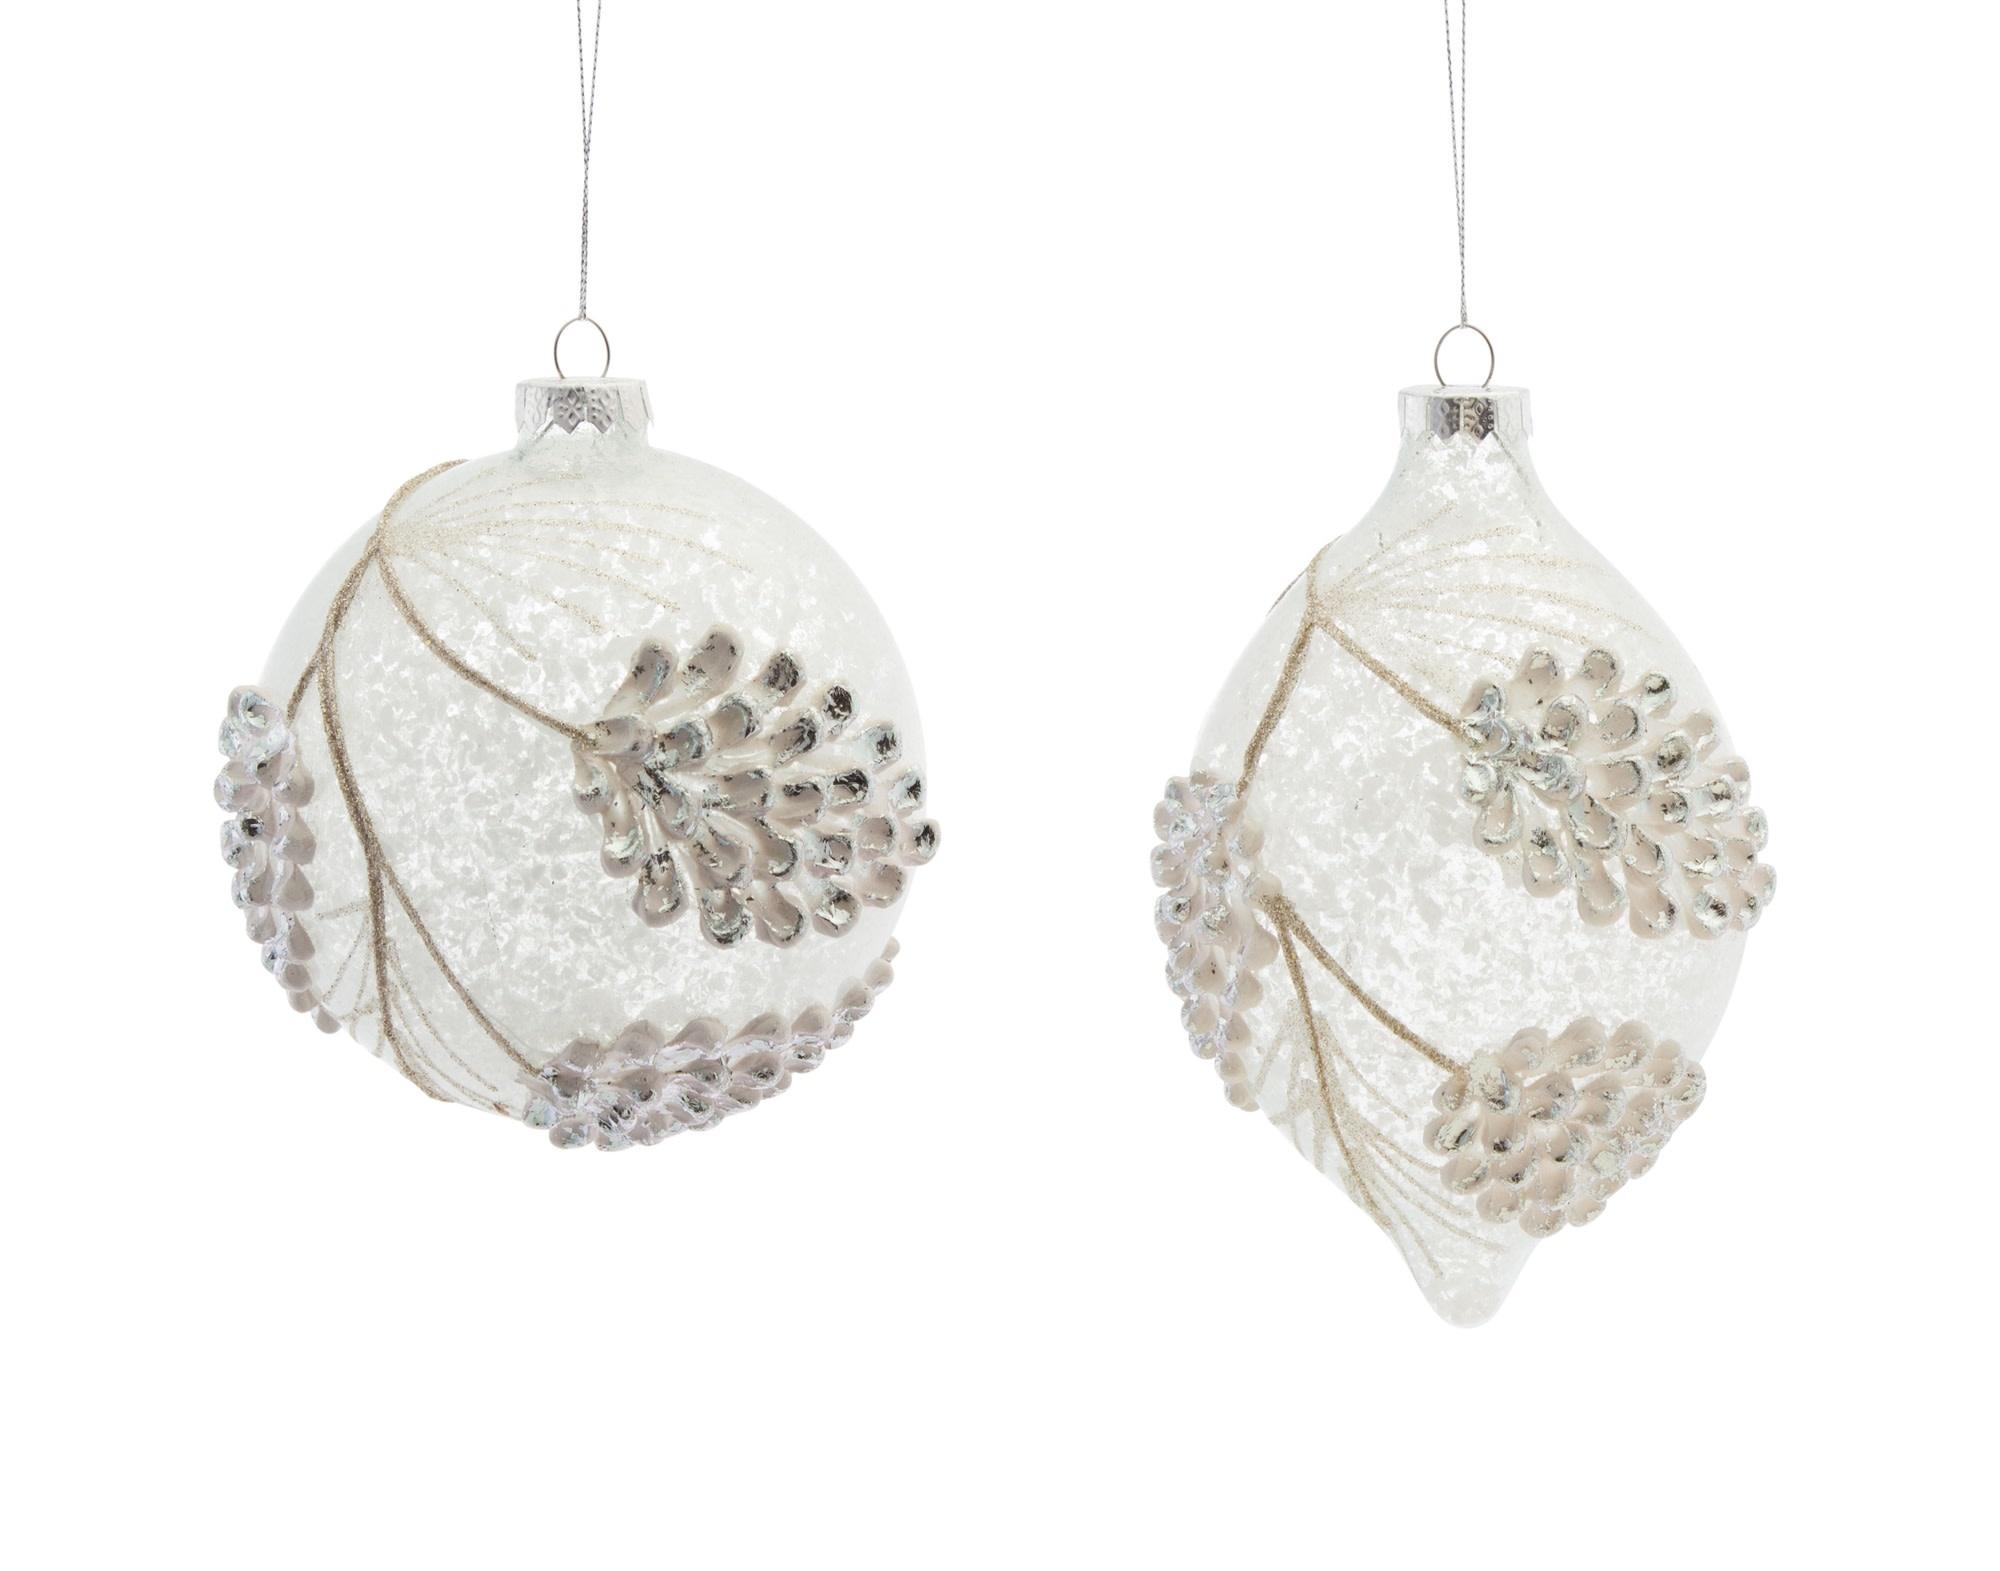 Snowed Pinecone Glass Ornament (2-Styles)